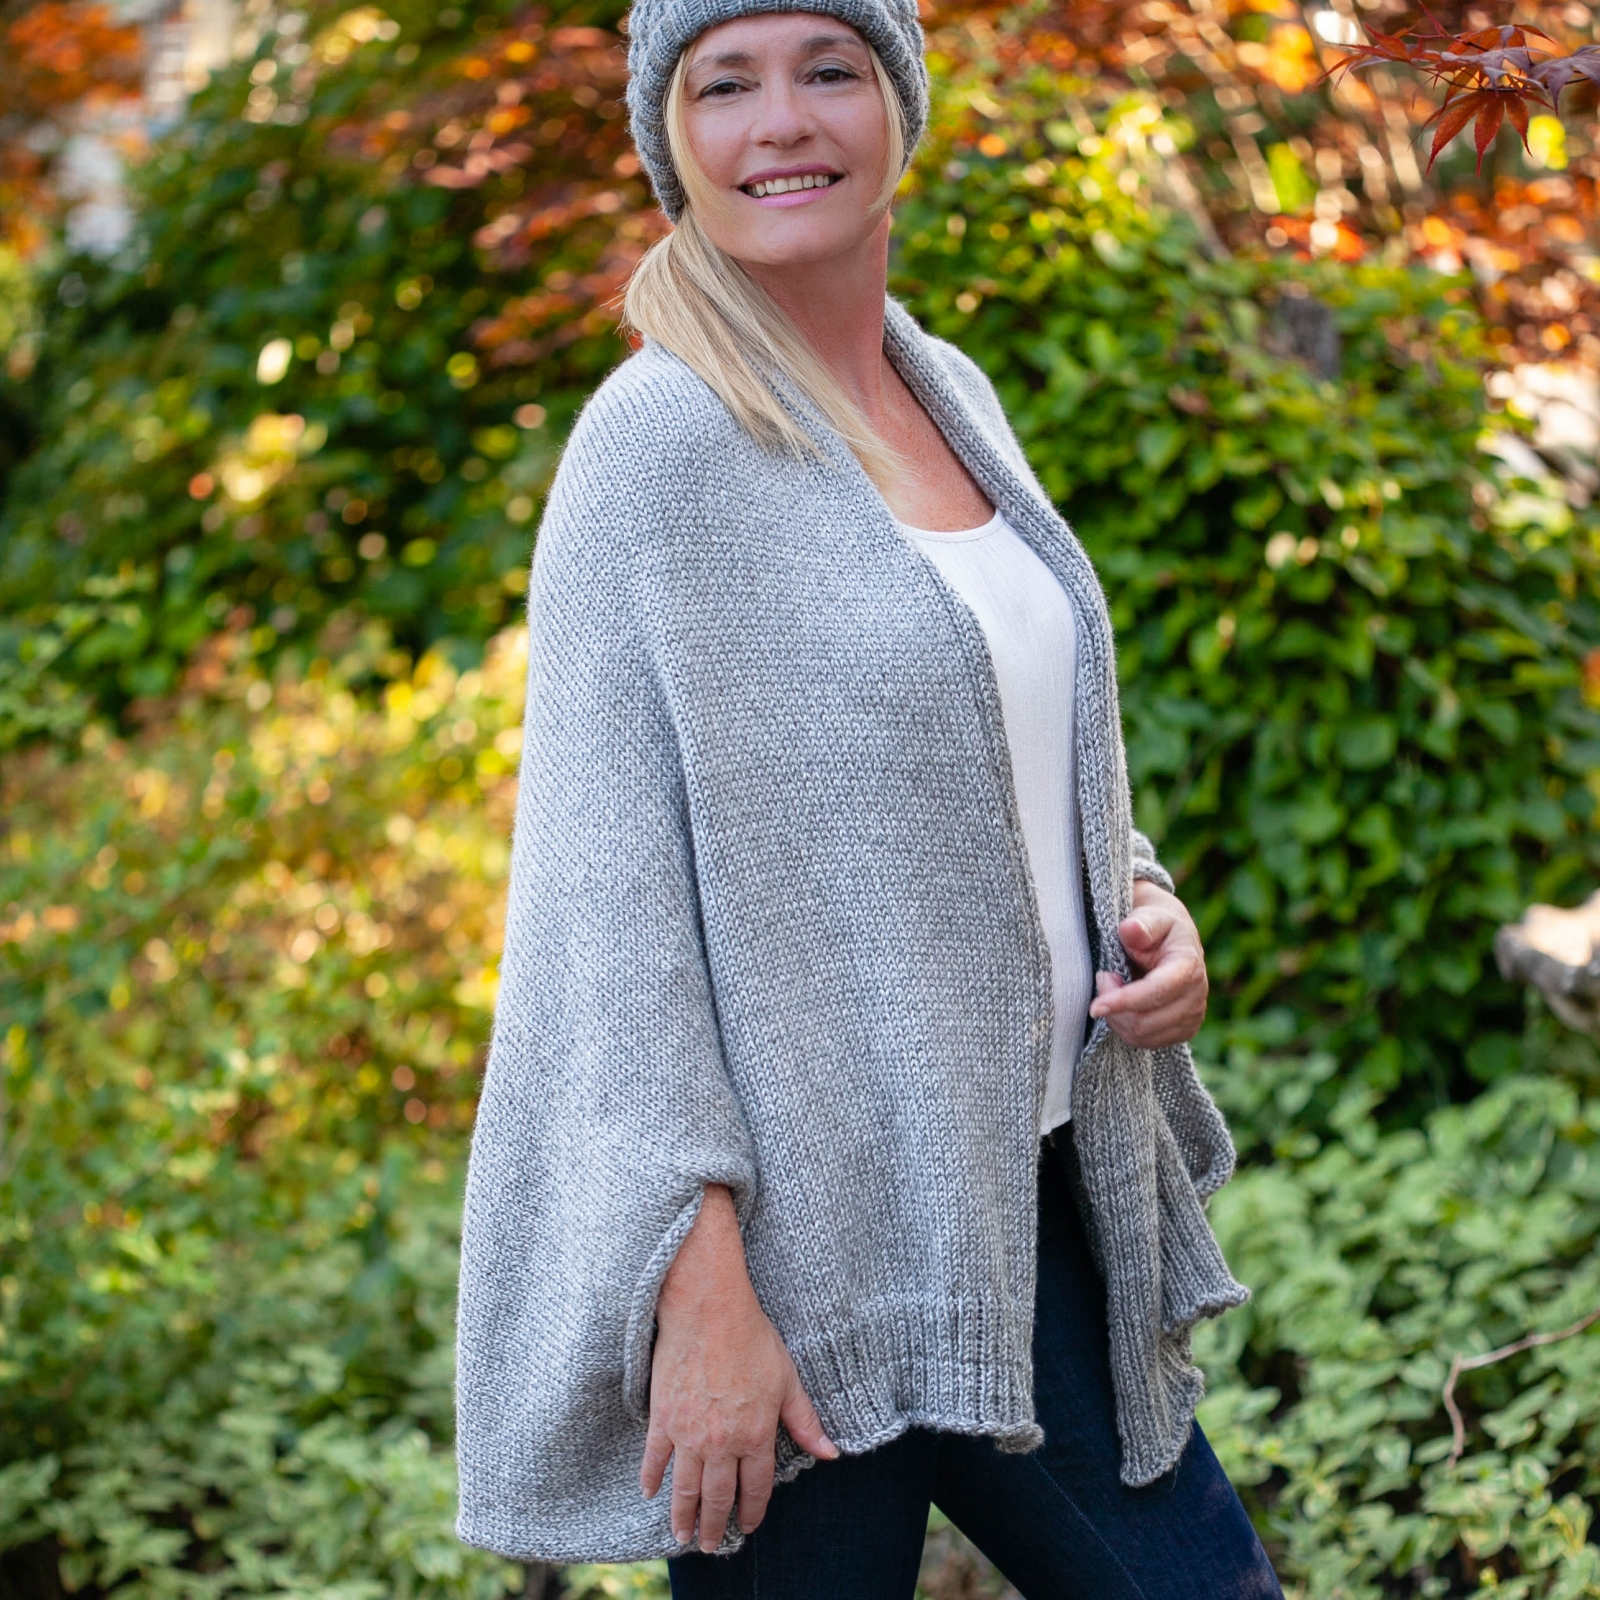 Loom Knit Shrug Style Cardigan Pattern  Oversized fit, Warm Winter Sweater   PDF PATTERN Download